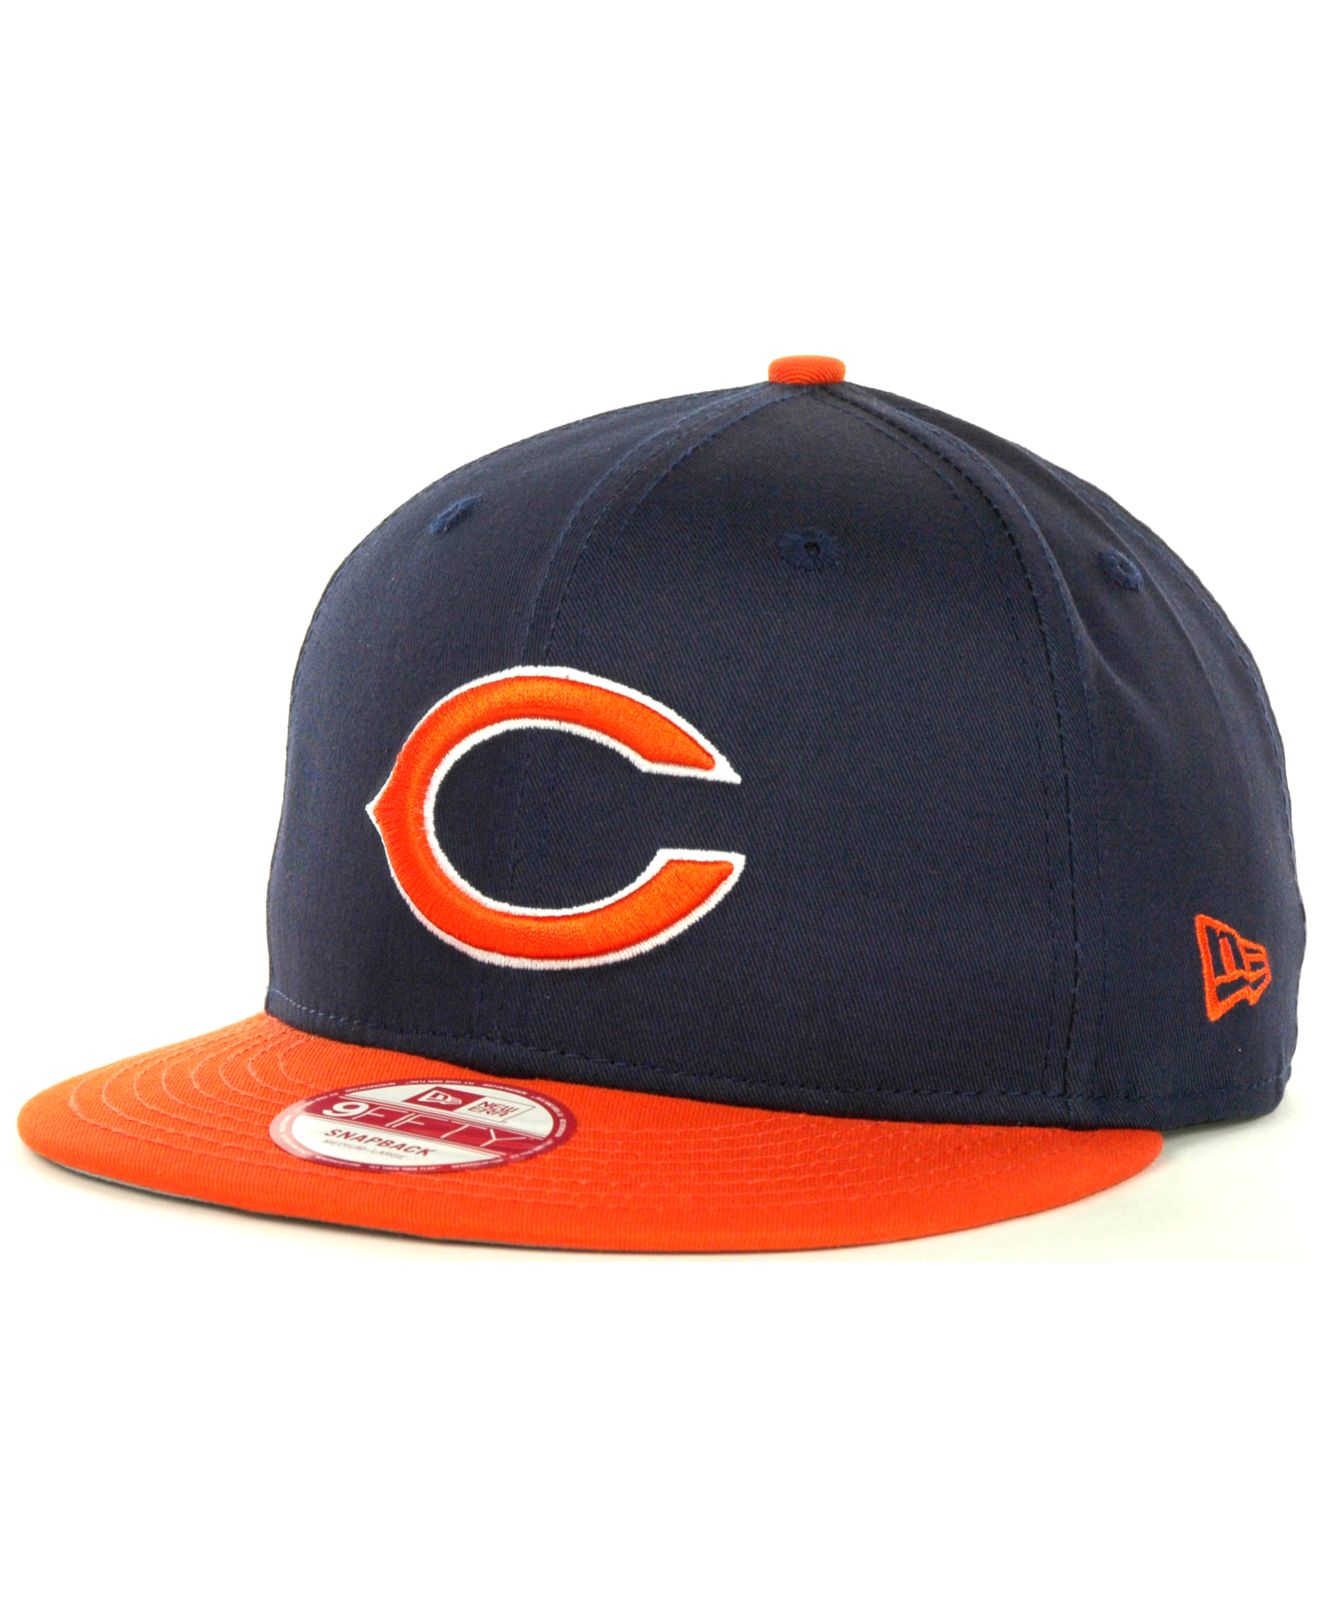 7342265329c Lyst - KTZ Chicago Bears 9fifty Snapback Hat in Orange for Men